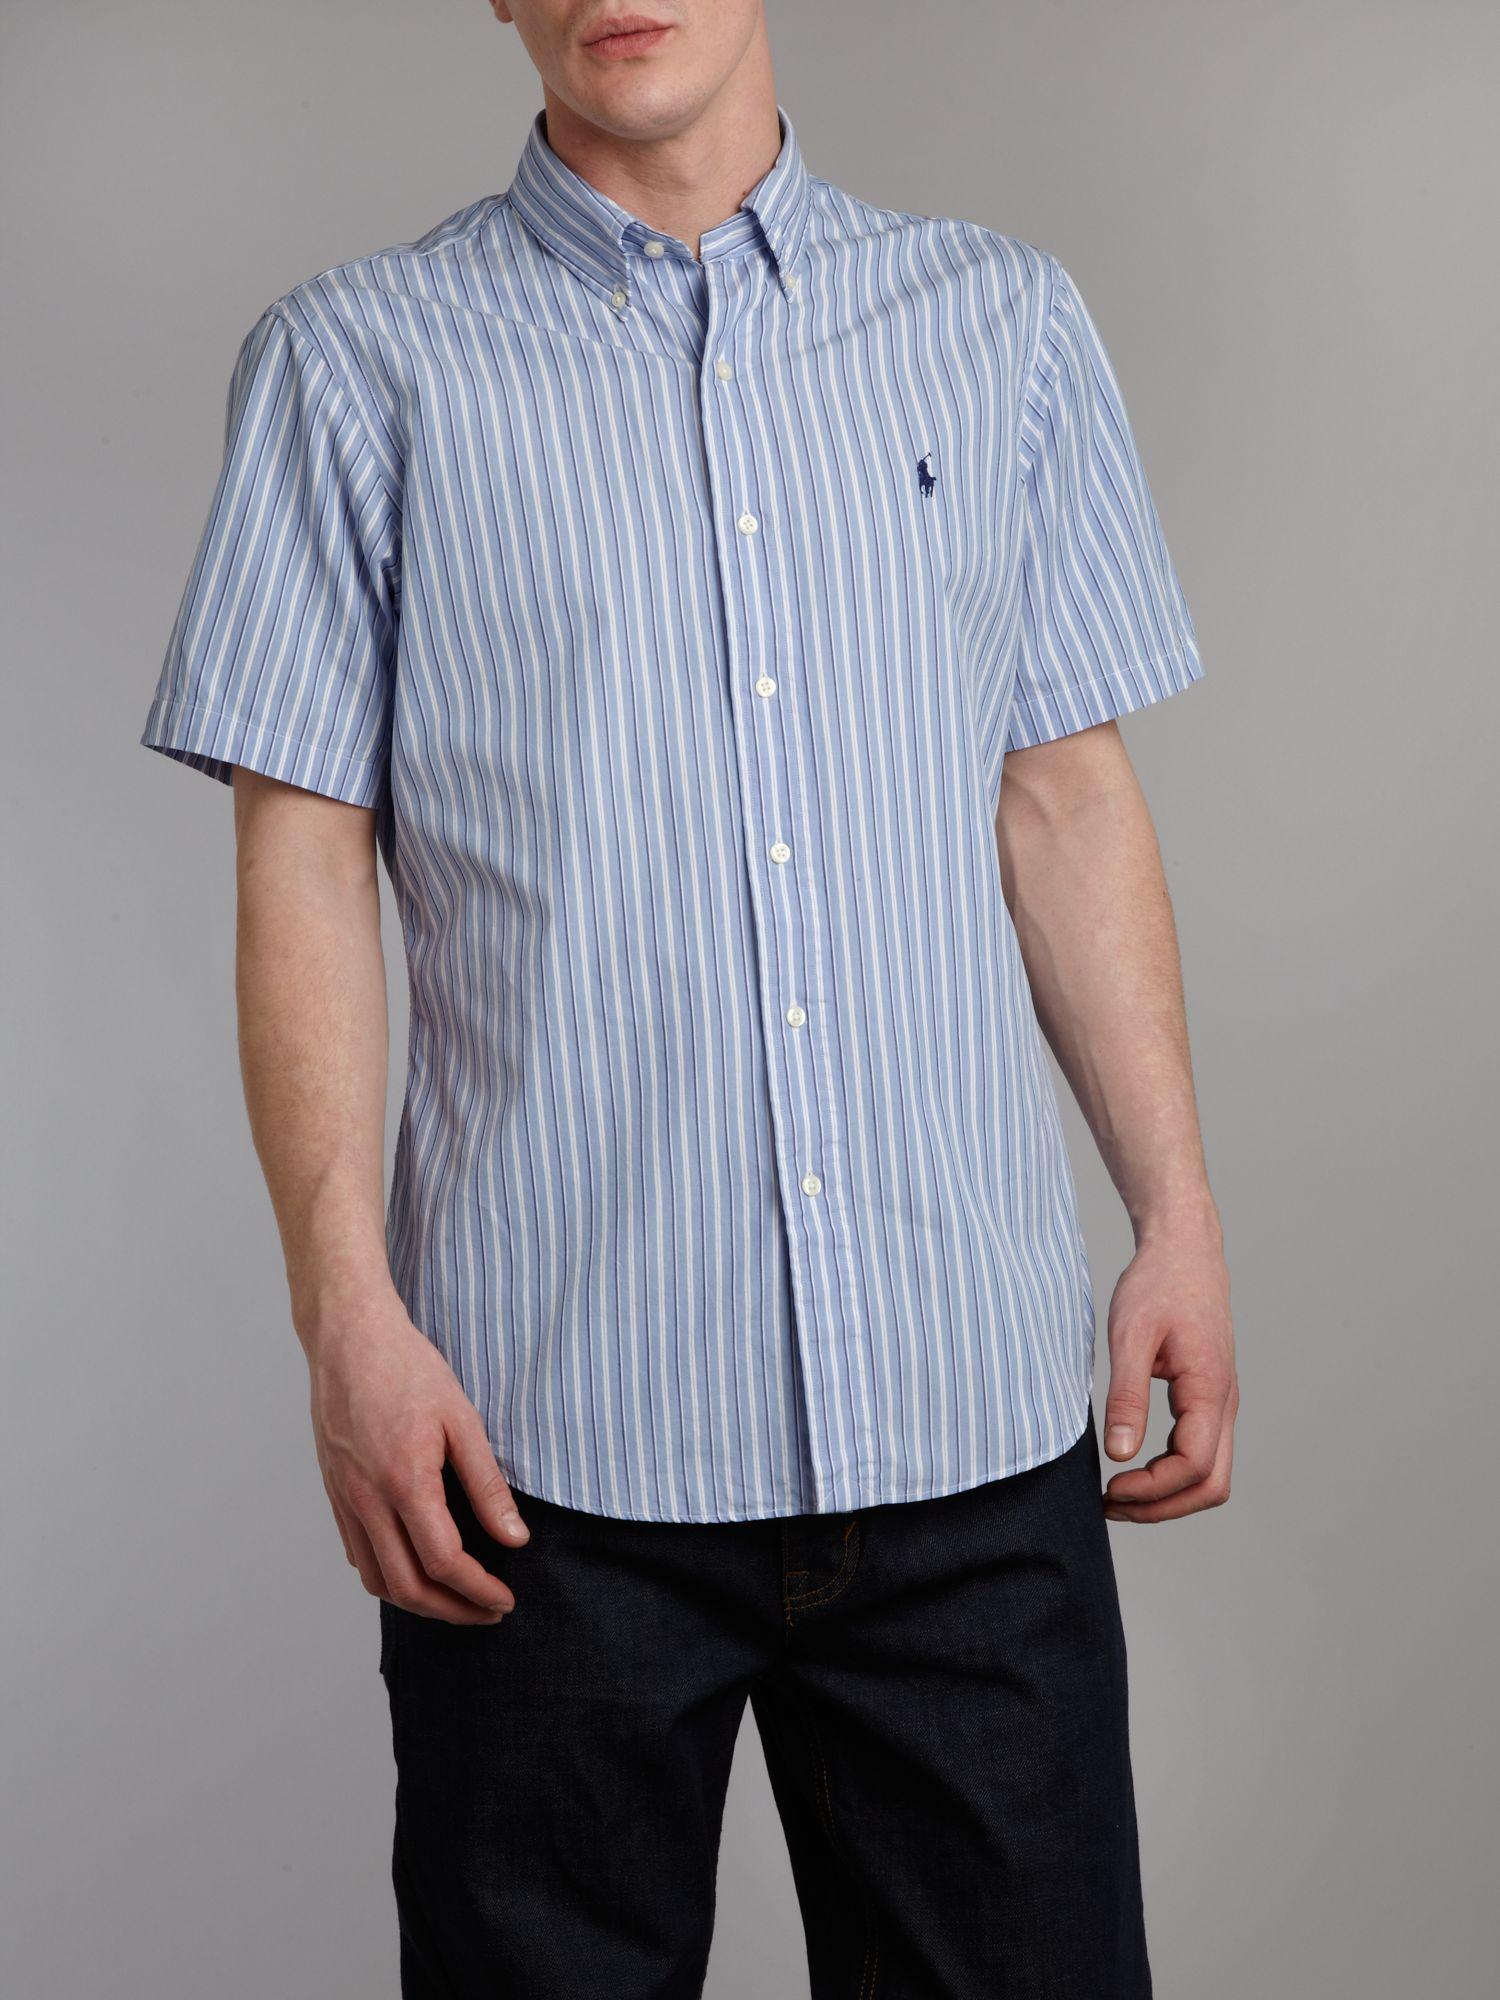 Polo Ralph Lauren Short Sleeved Striped Shirt In Blue For